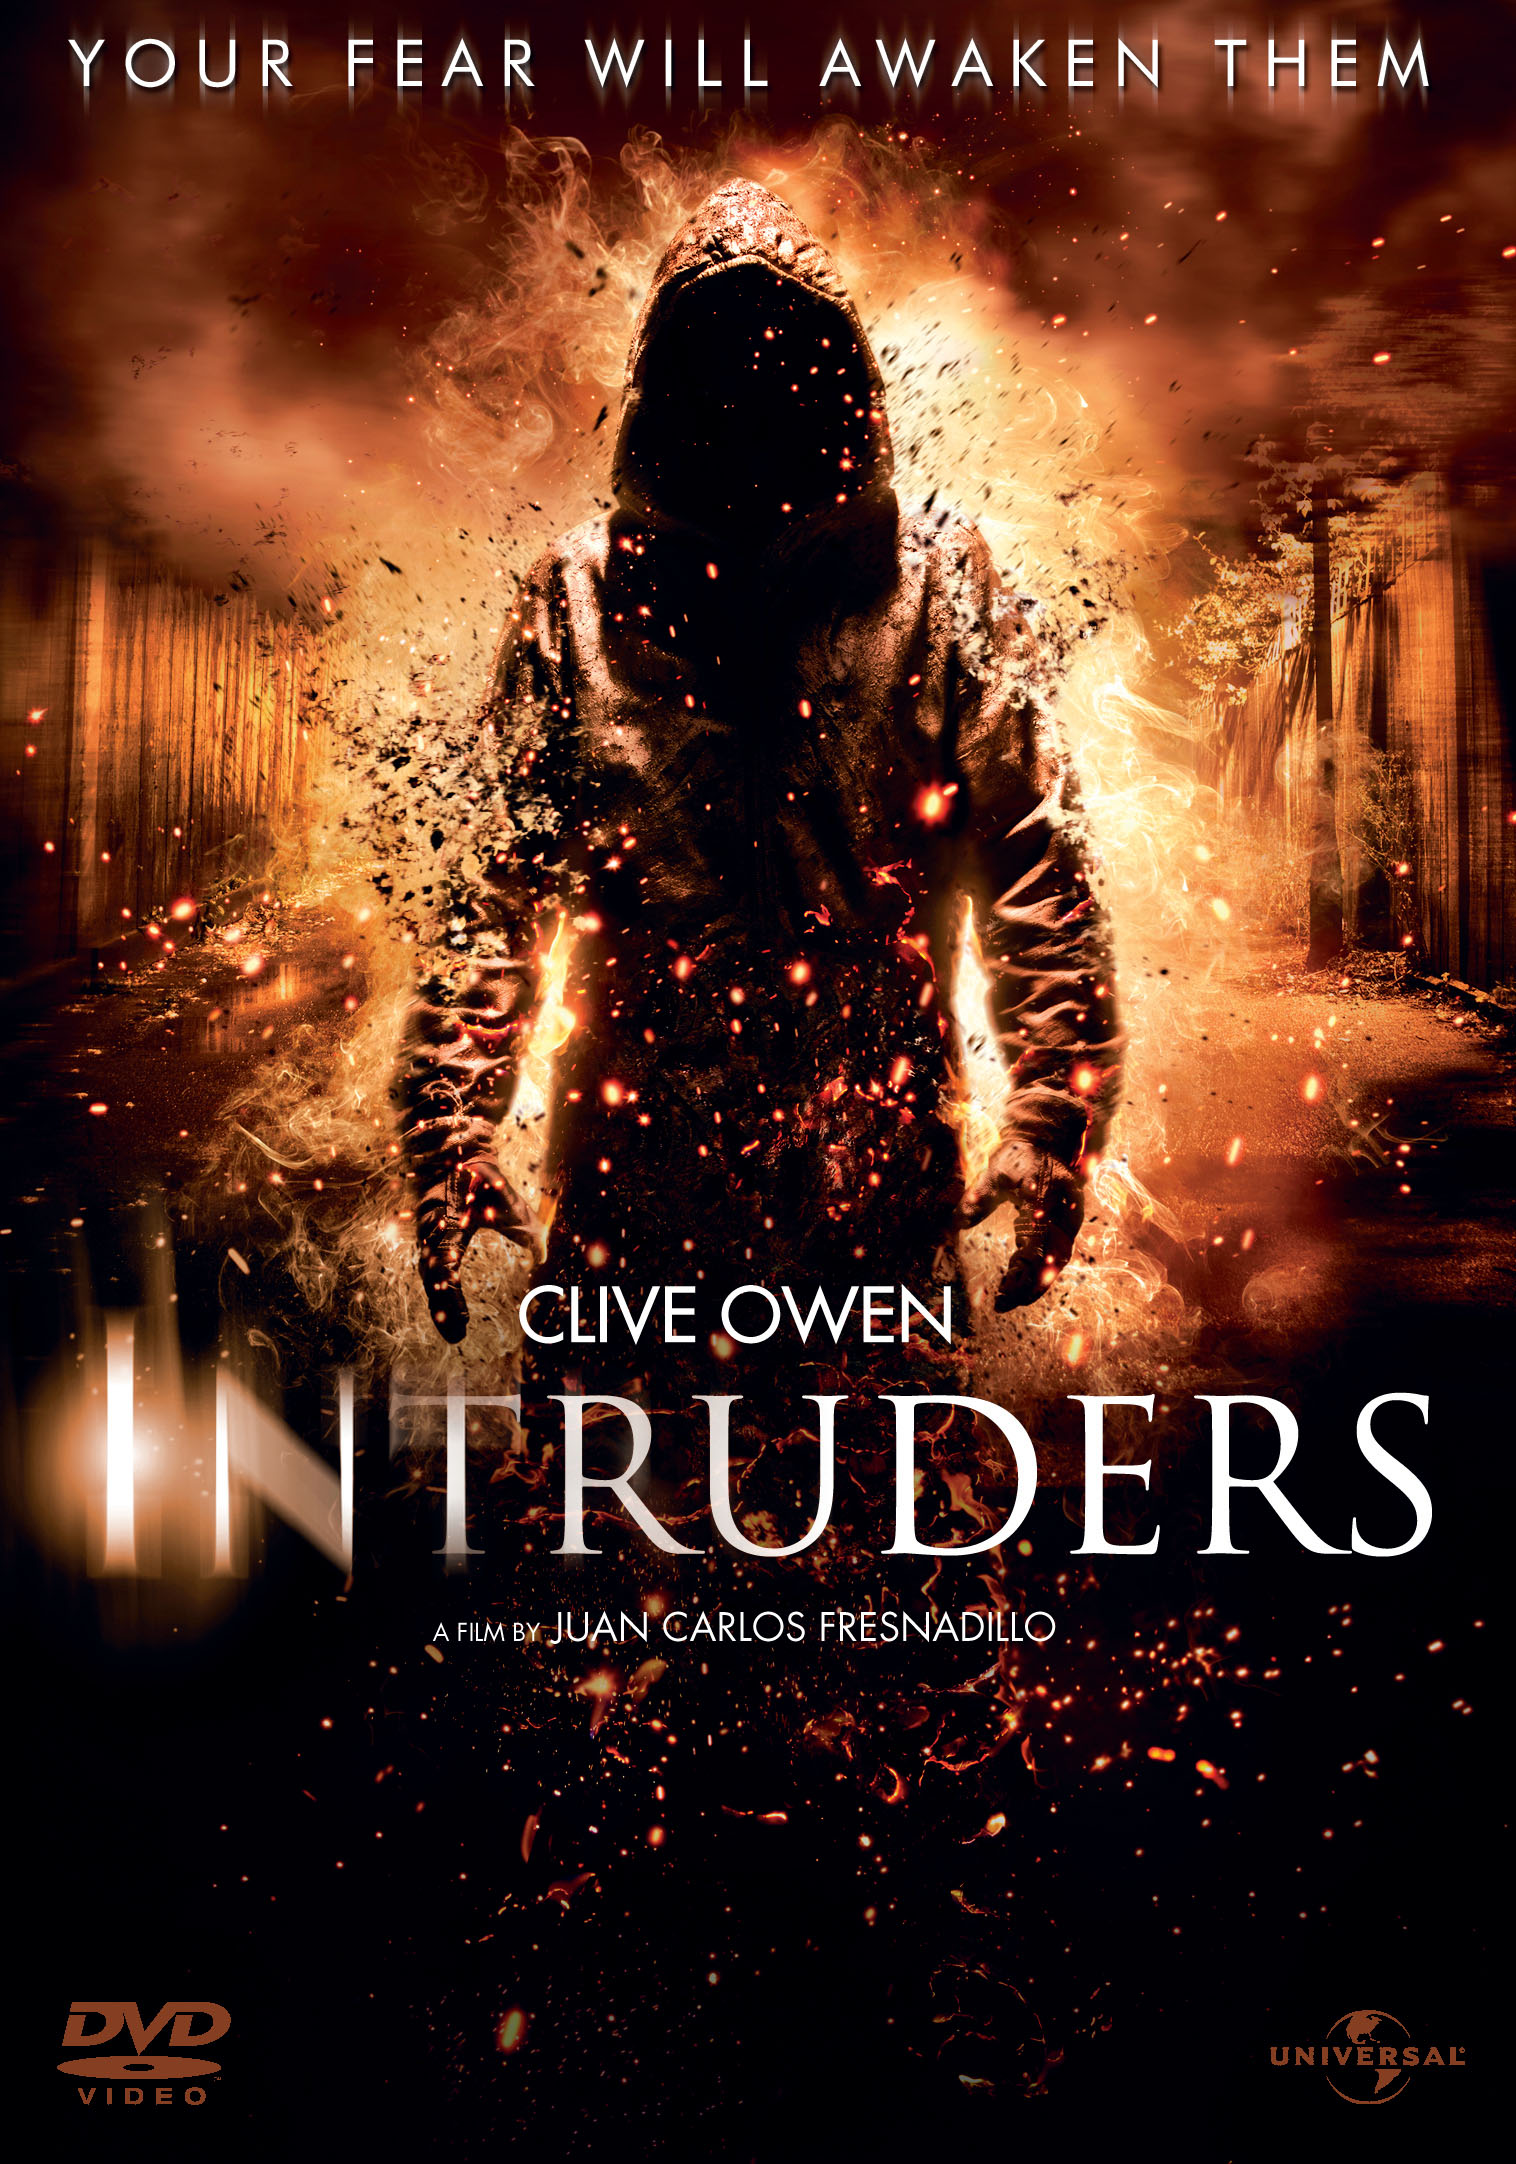 Intruders (I) (2011) - DVD PLANET STORE